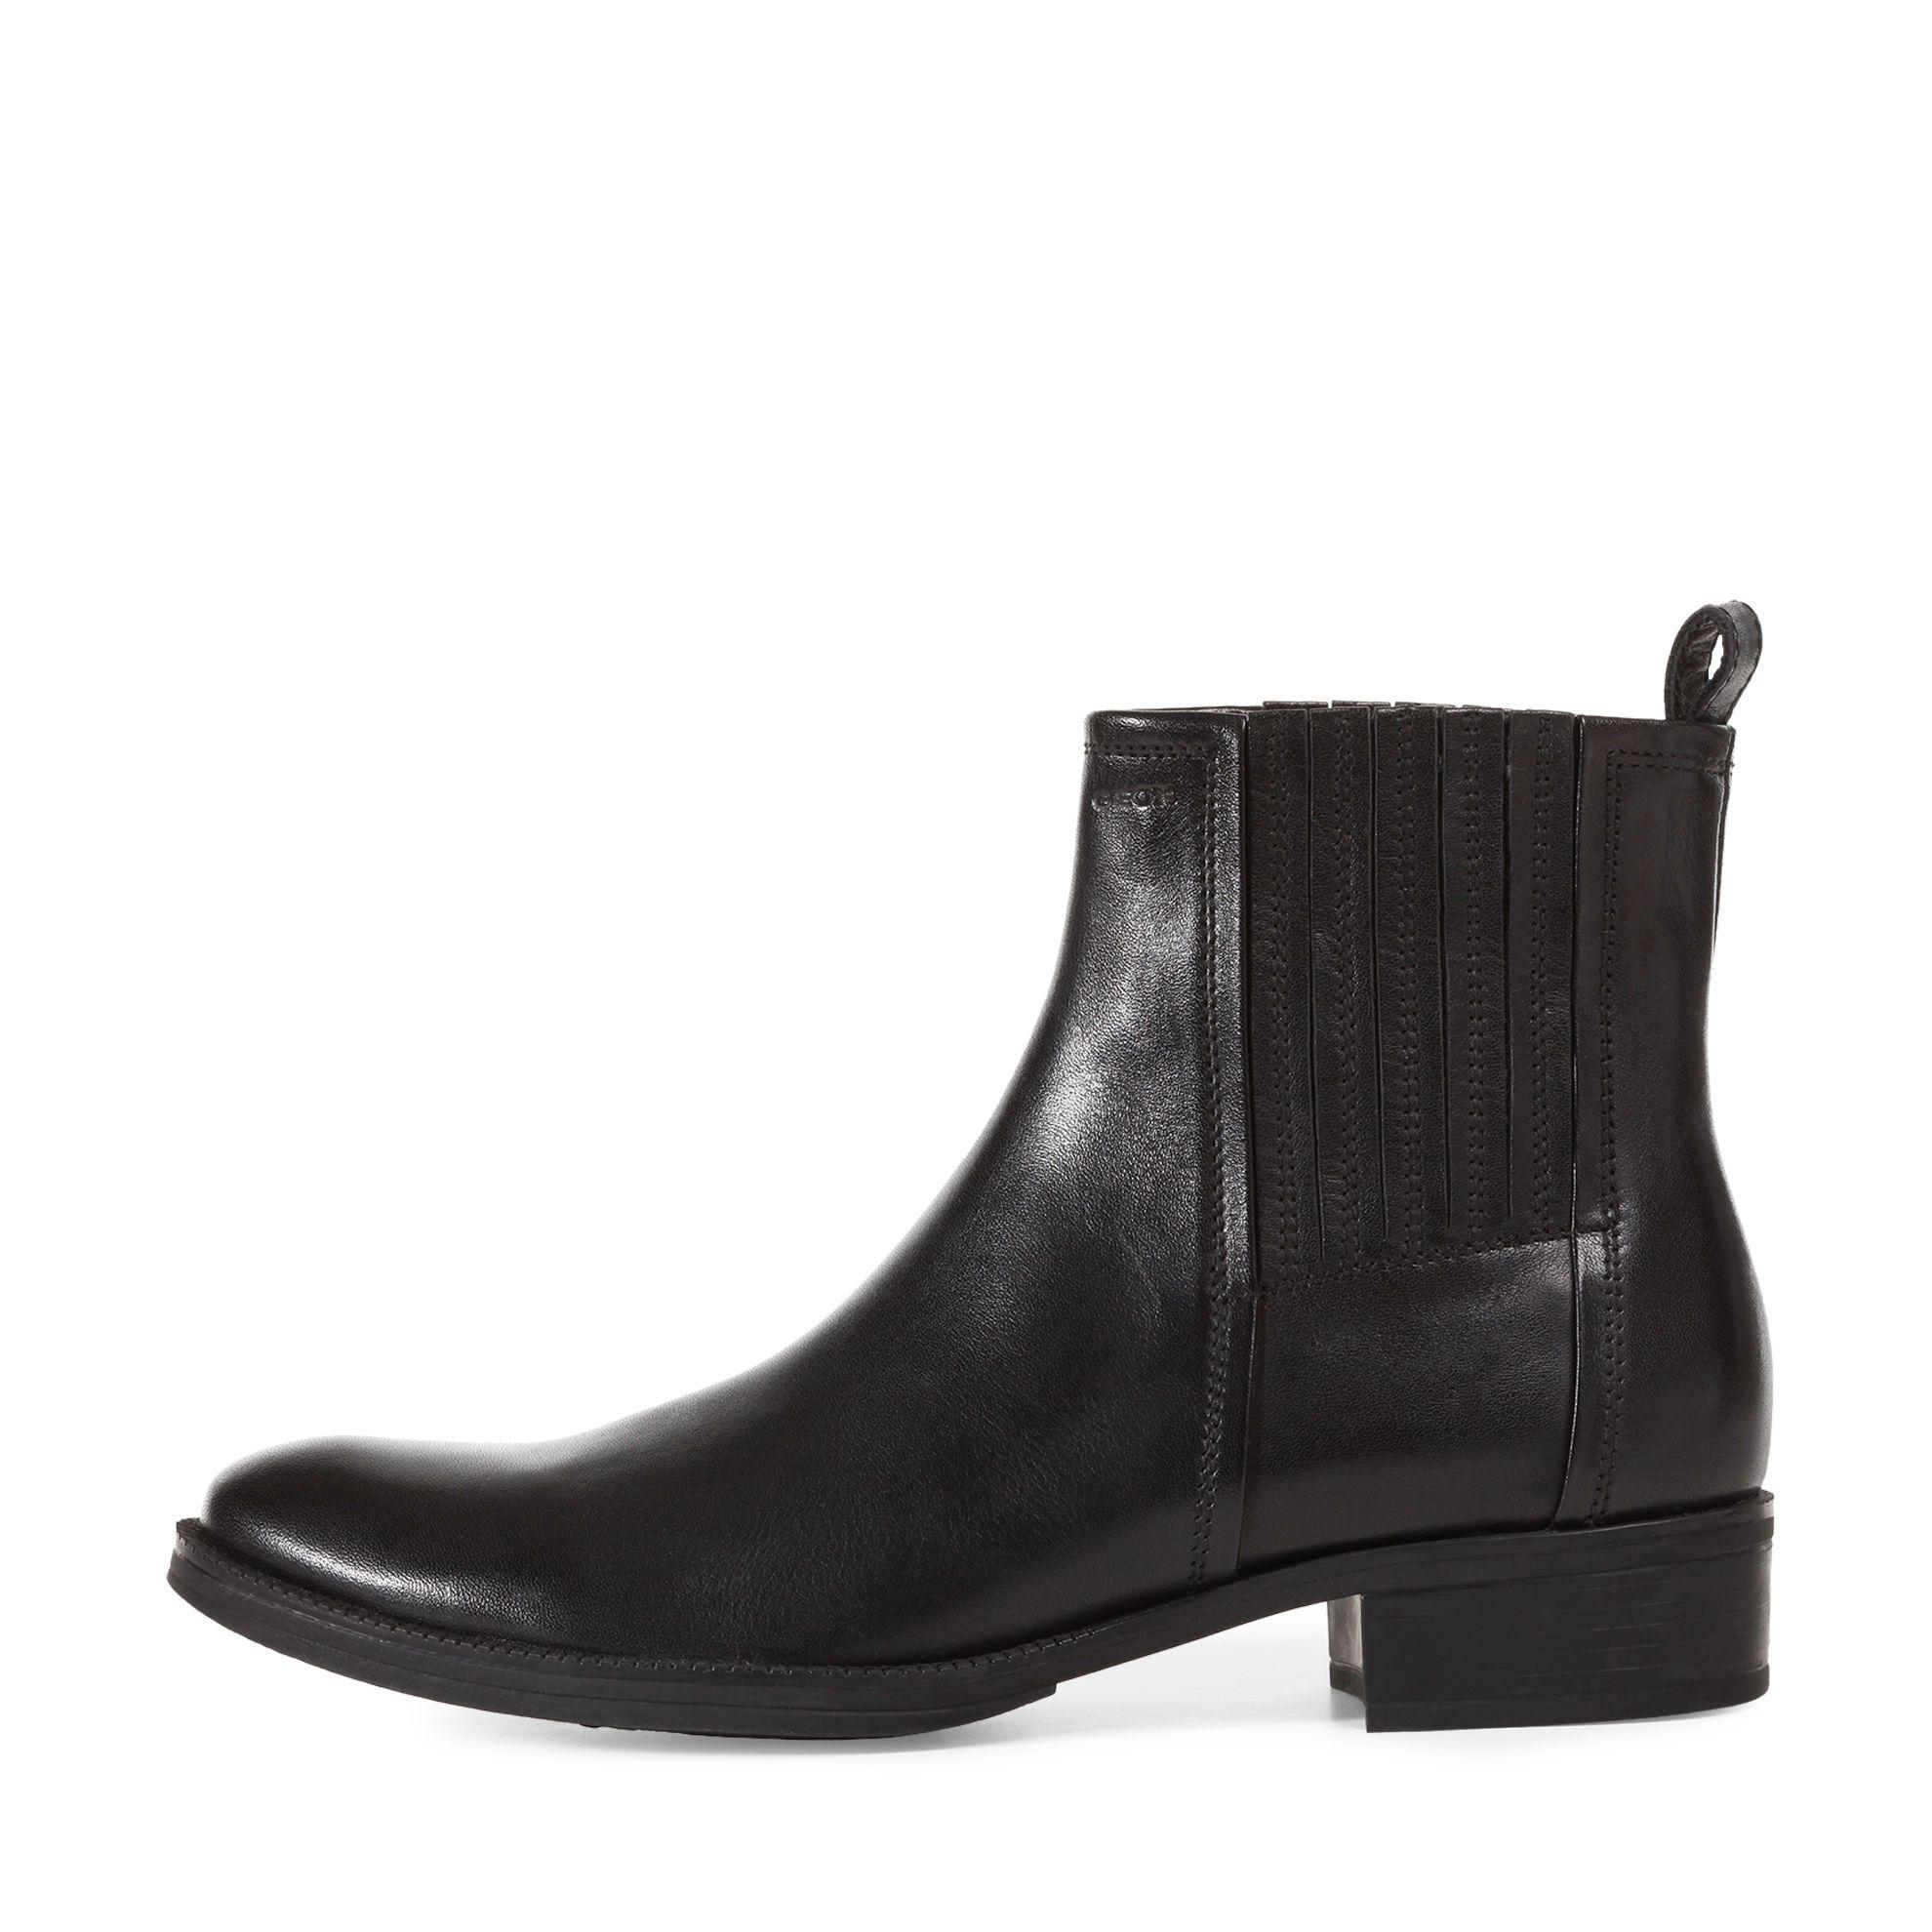 f10f46c270b Bottine femme Geox mendi à découvrir www.cardel-chaussures.com ...